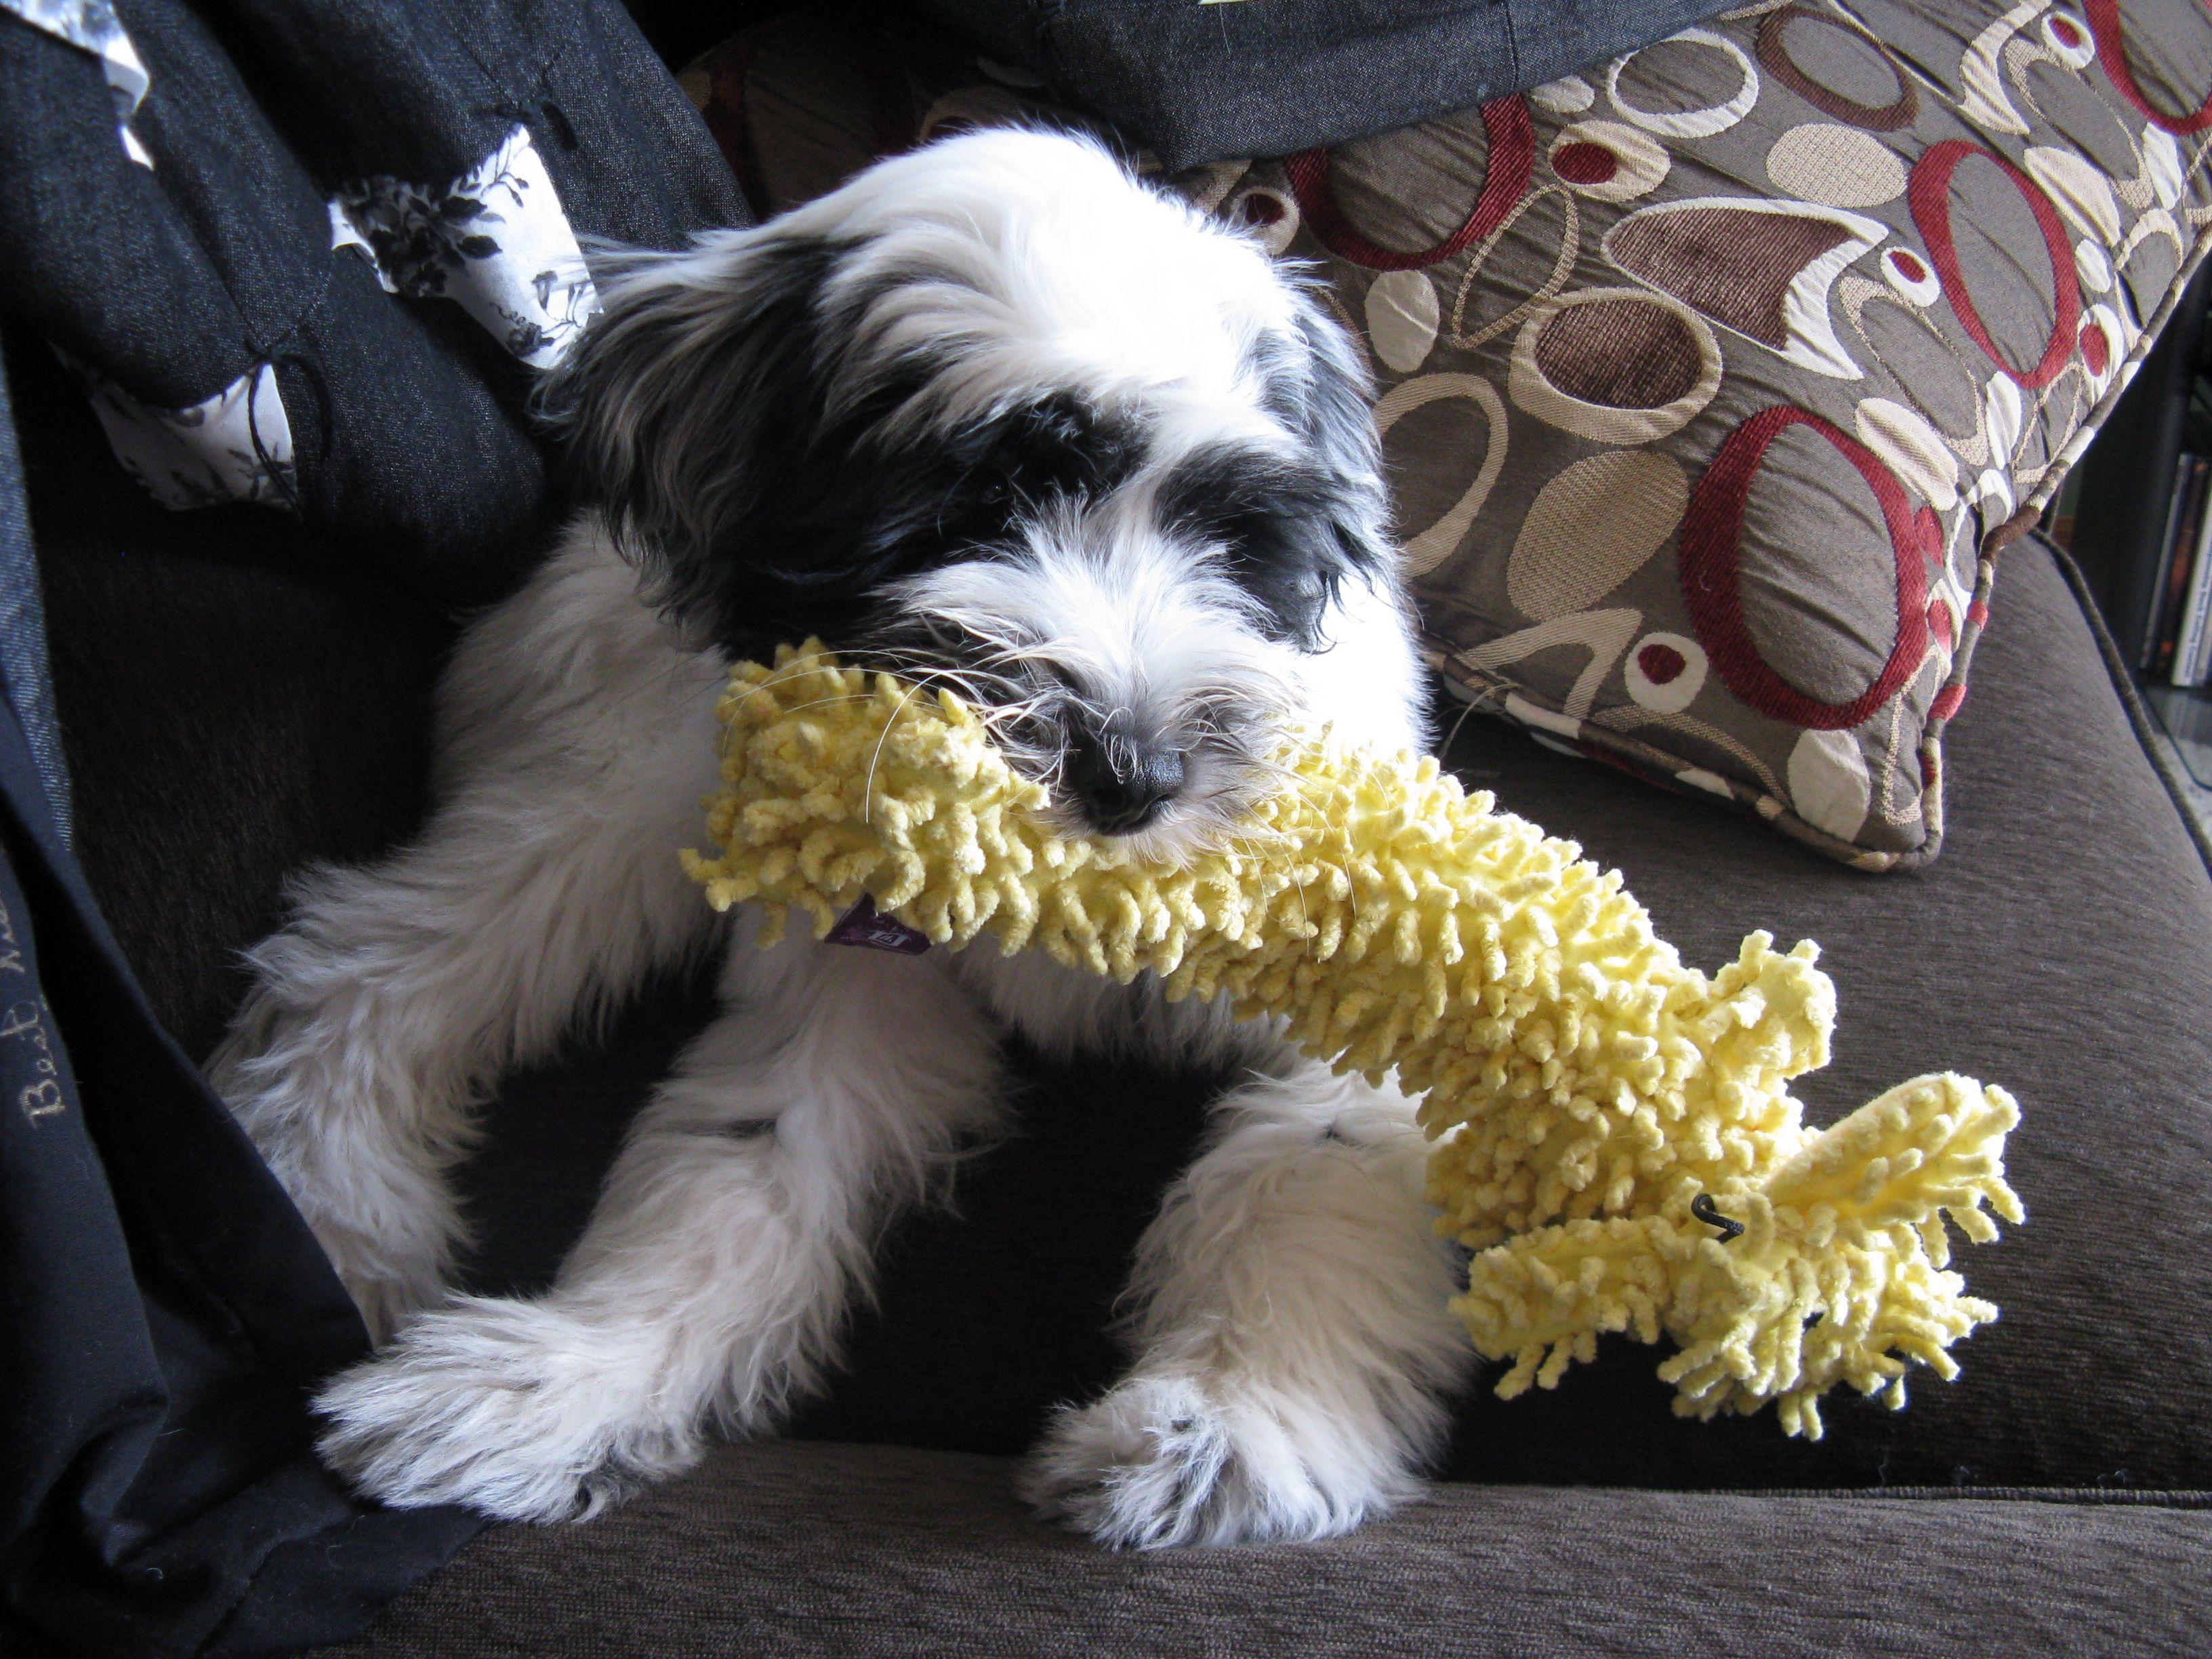 Play time! Tibetan Terrier puppy